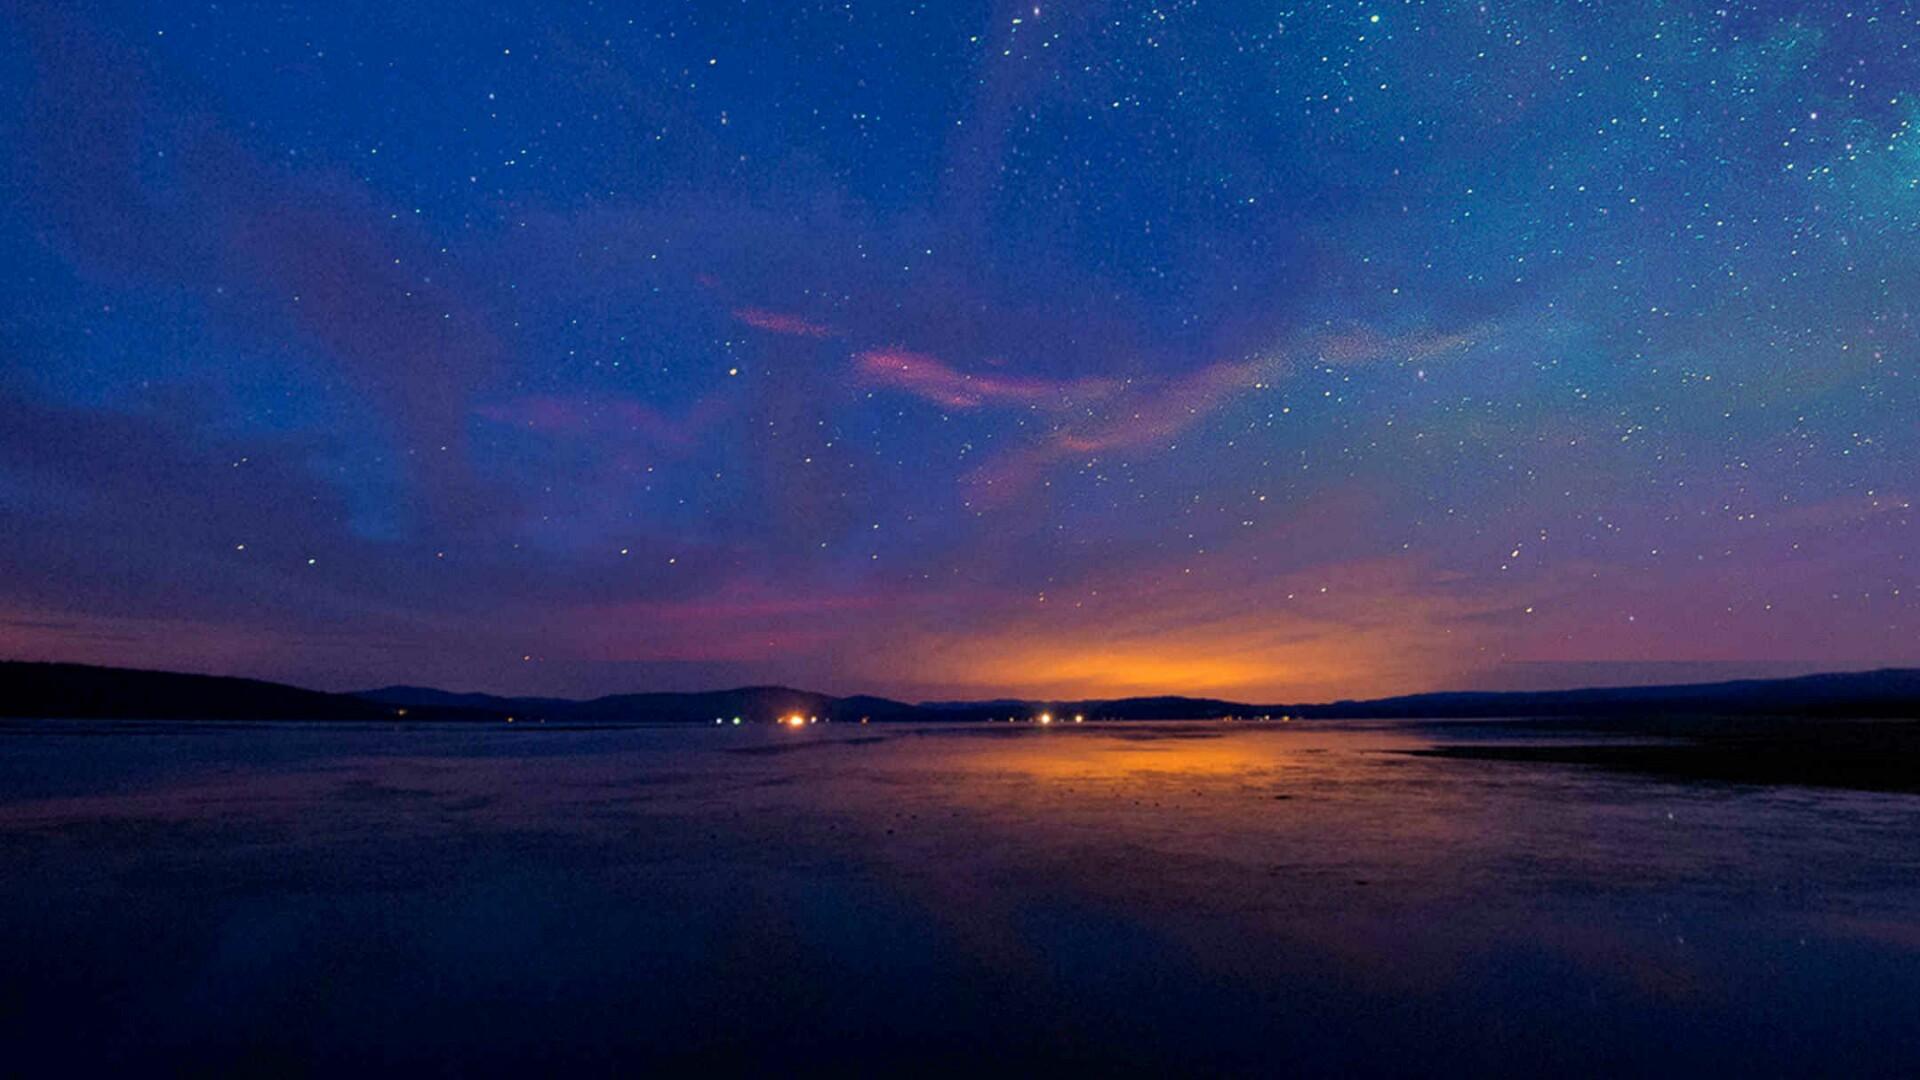 Title. Starry night sky ✨